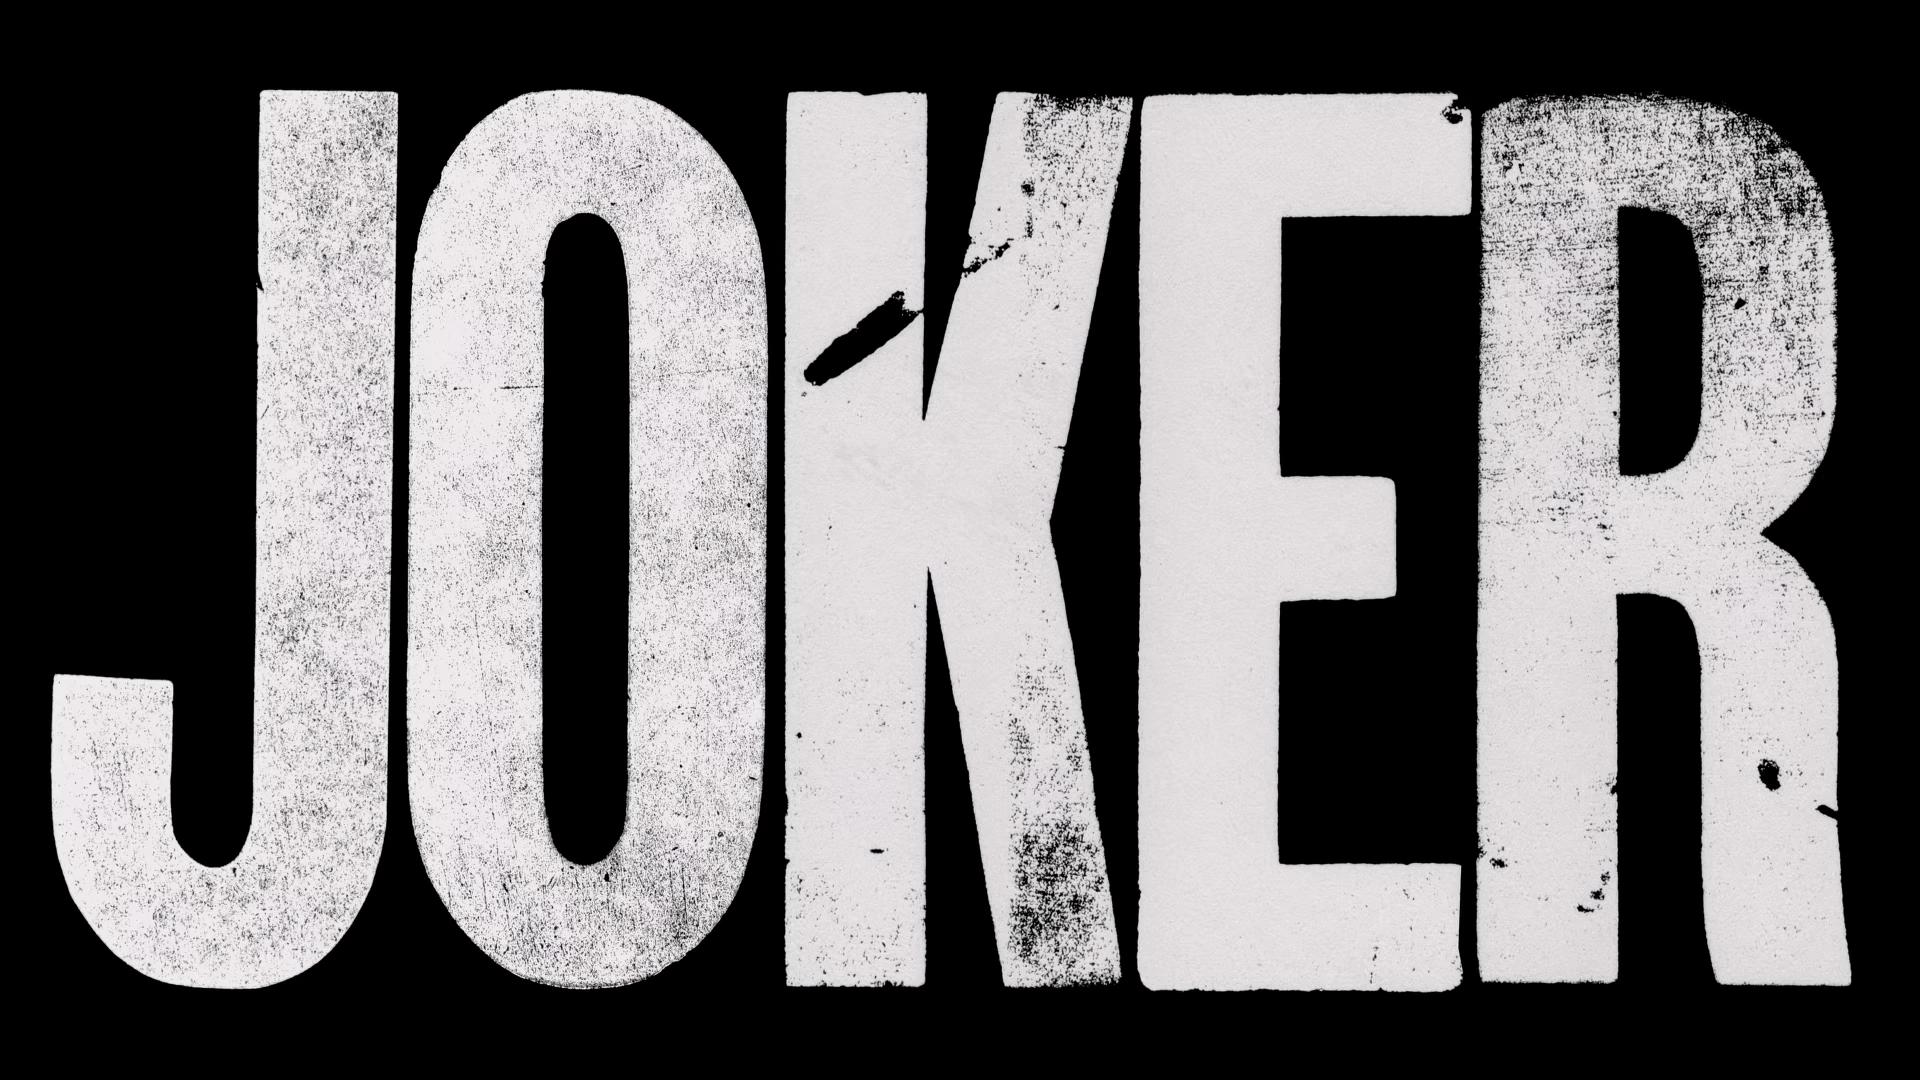 Wallpaper Joker Joaquin Phoenix The New Joker 1920x1080